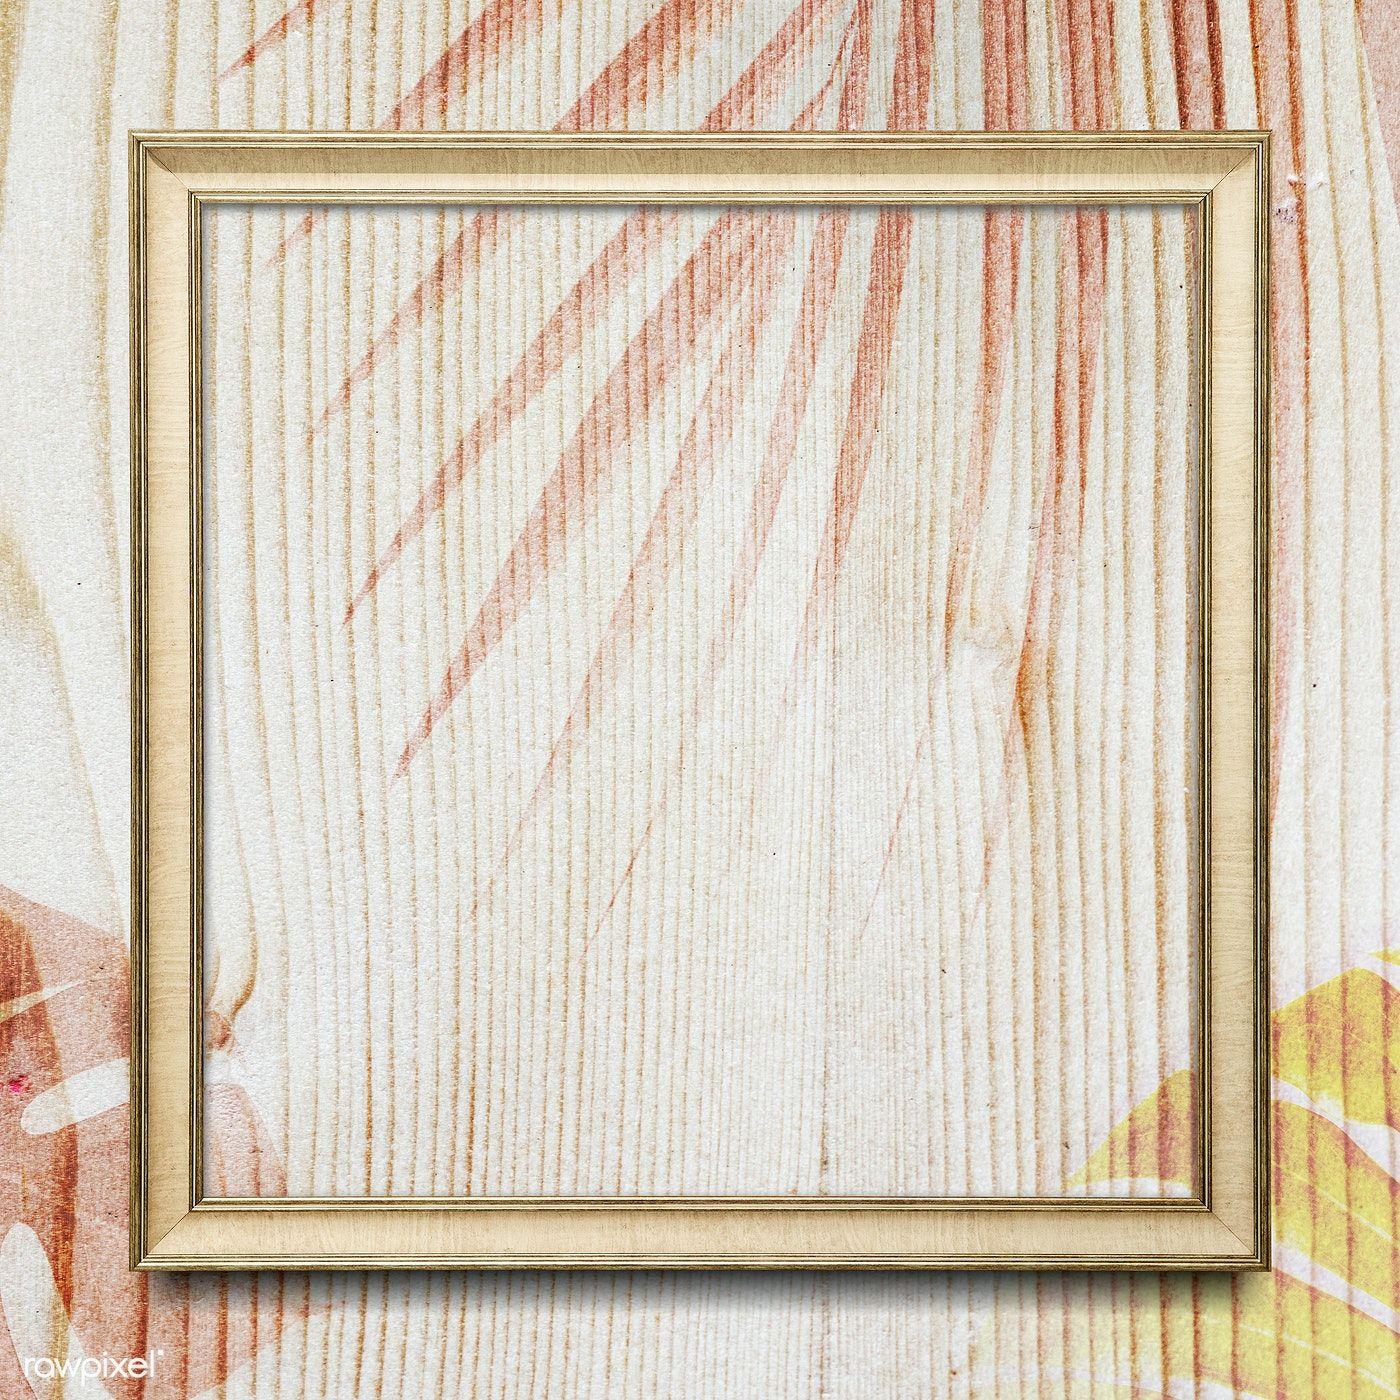 Download Premium Illustration Of Square Frame With Leaves Decoration On ในป 2020